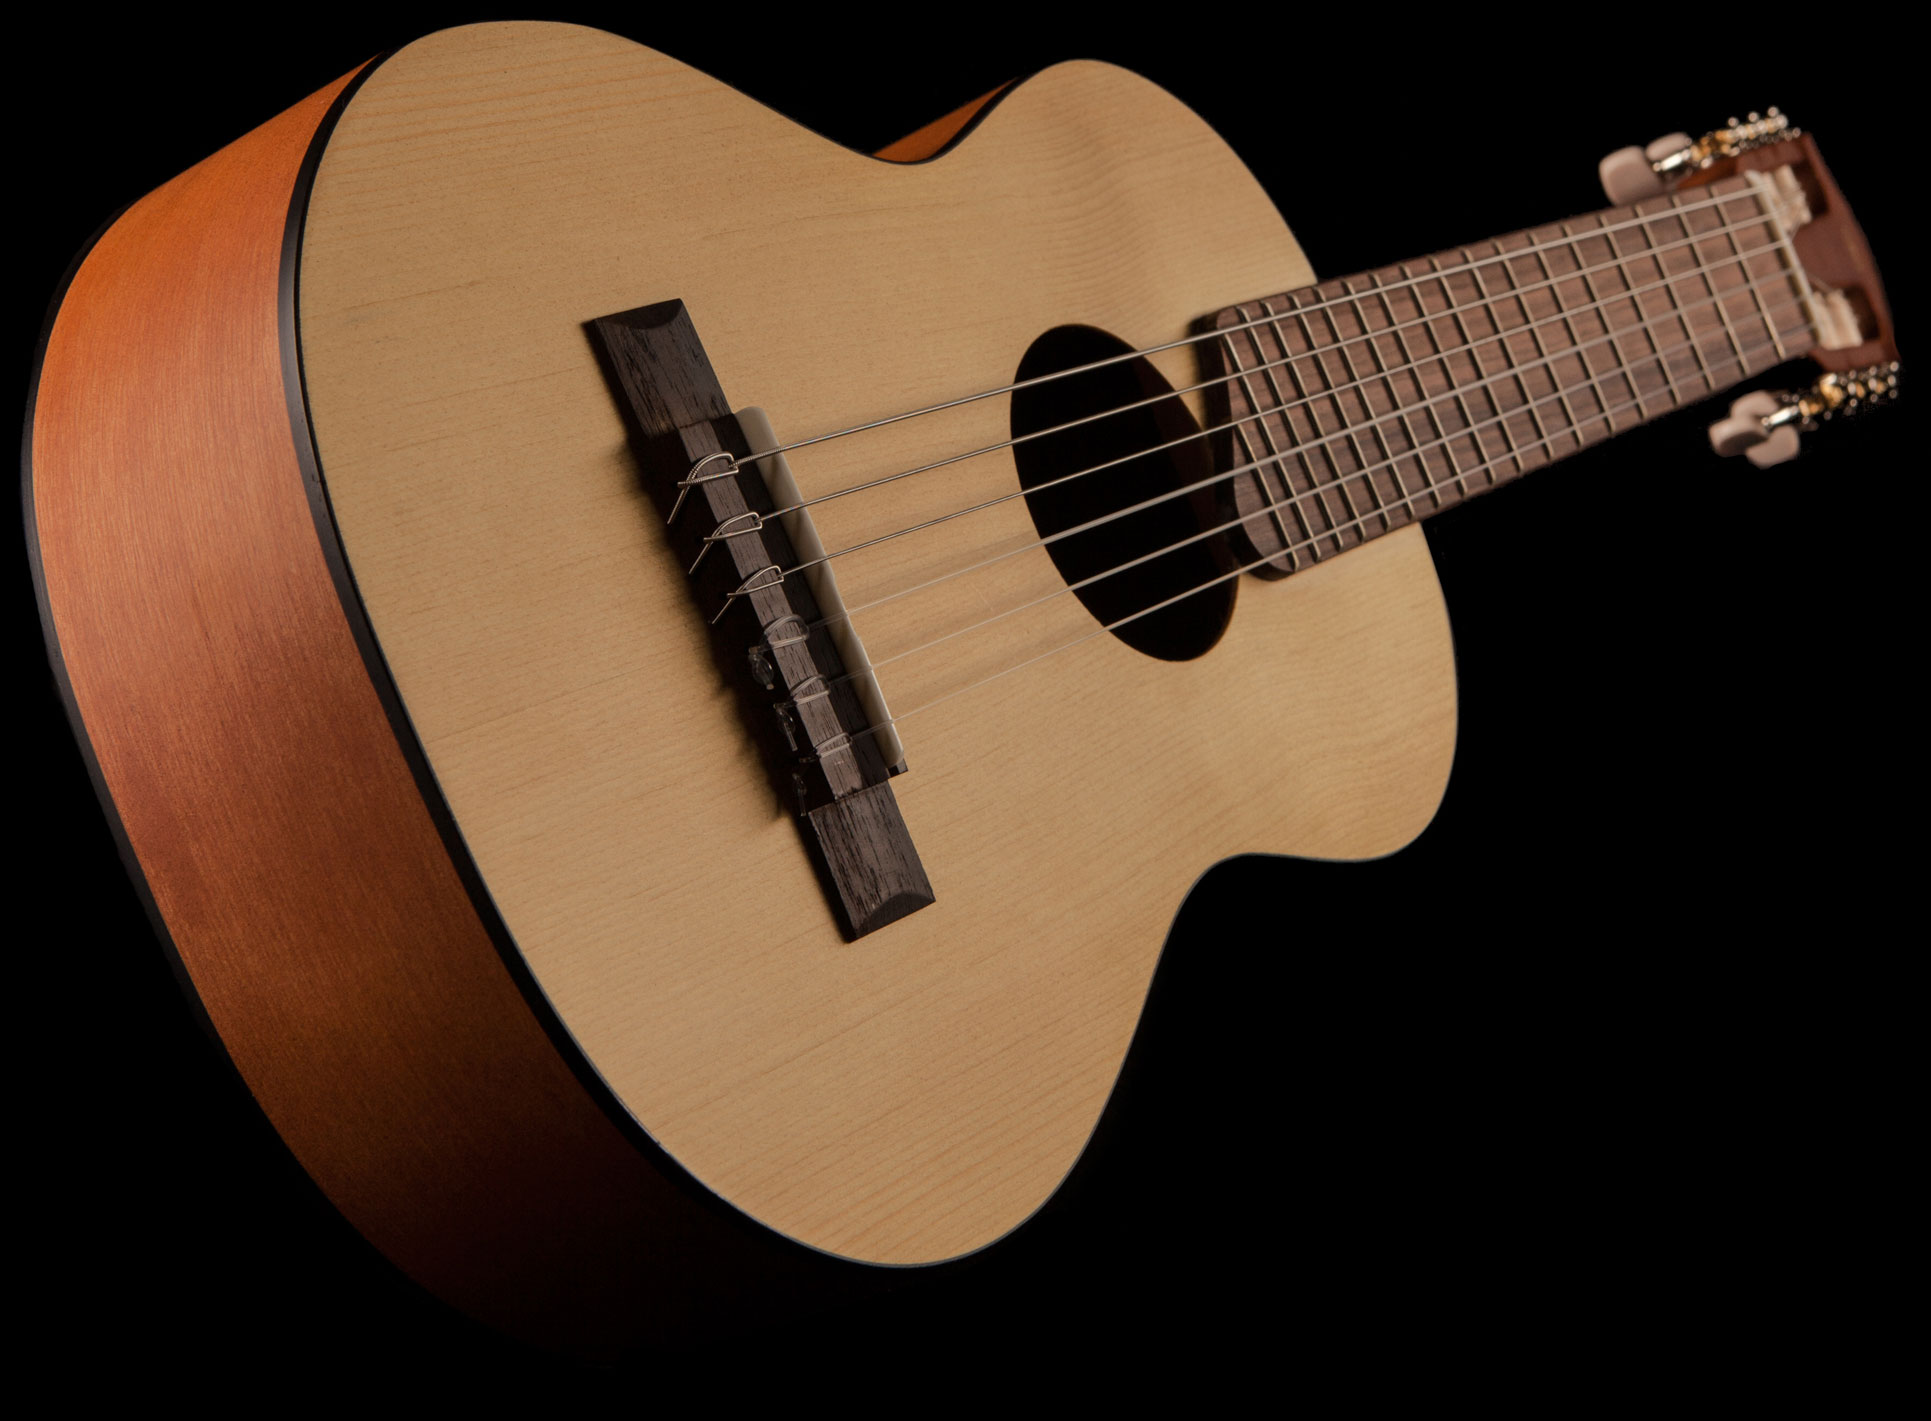 Yamaha Gl1 Guitalele Micro Guitar In Natural Wood Finish